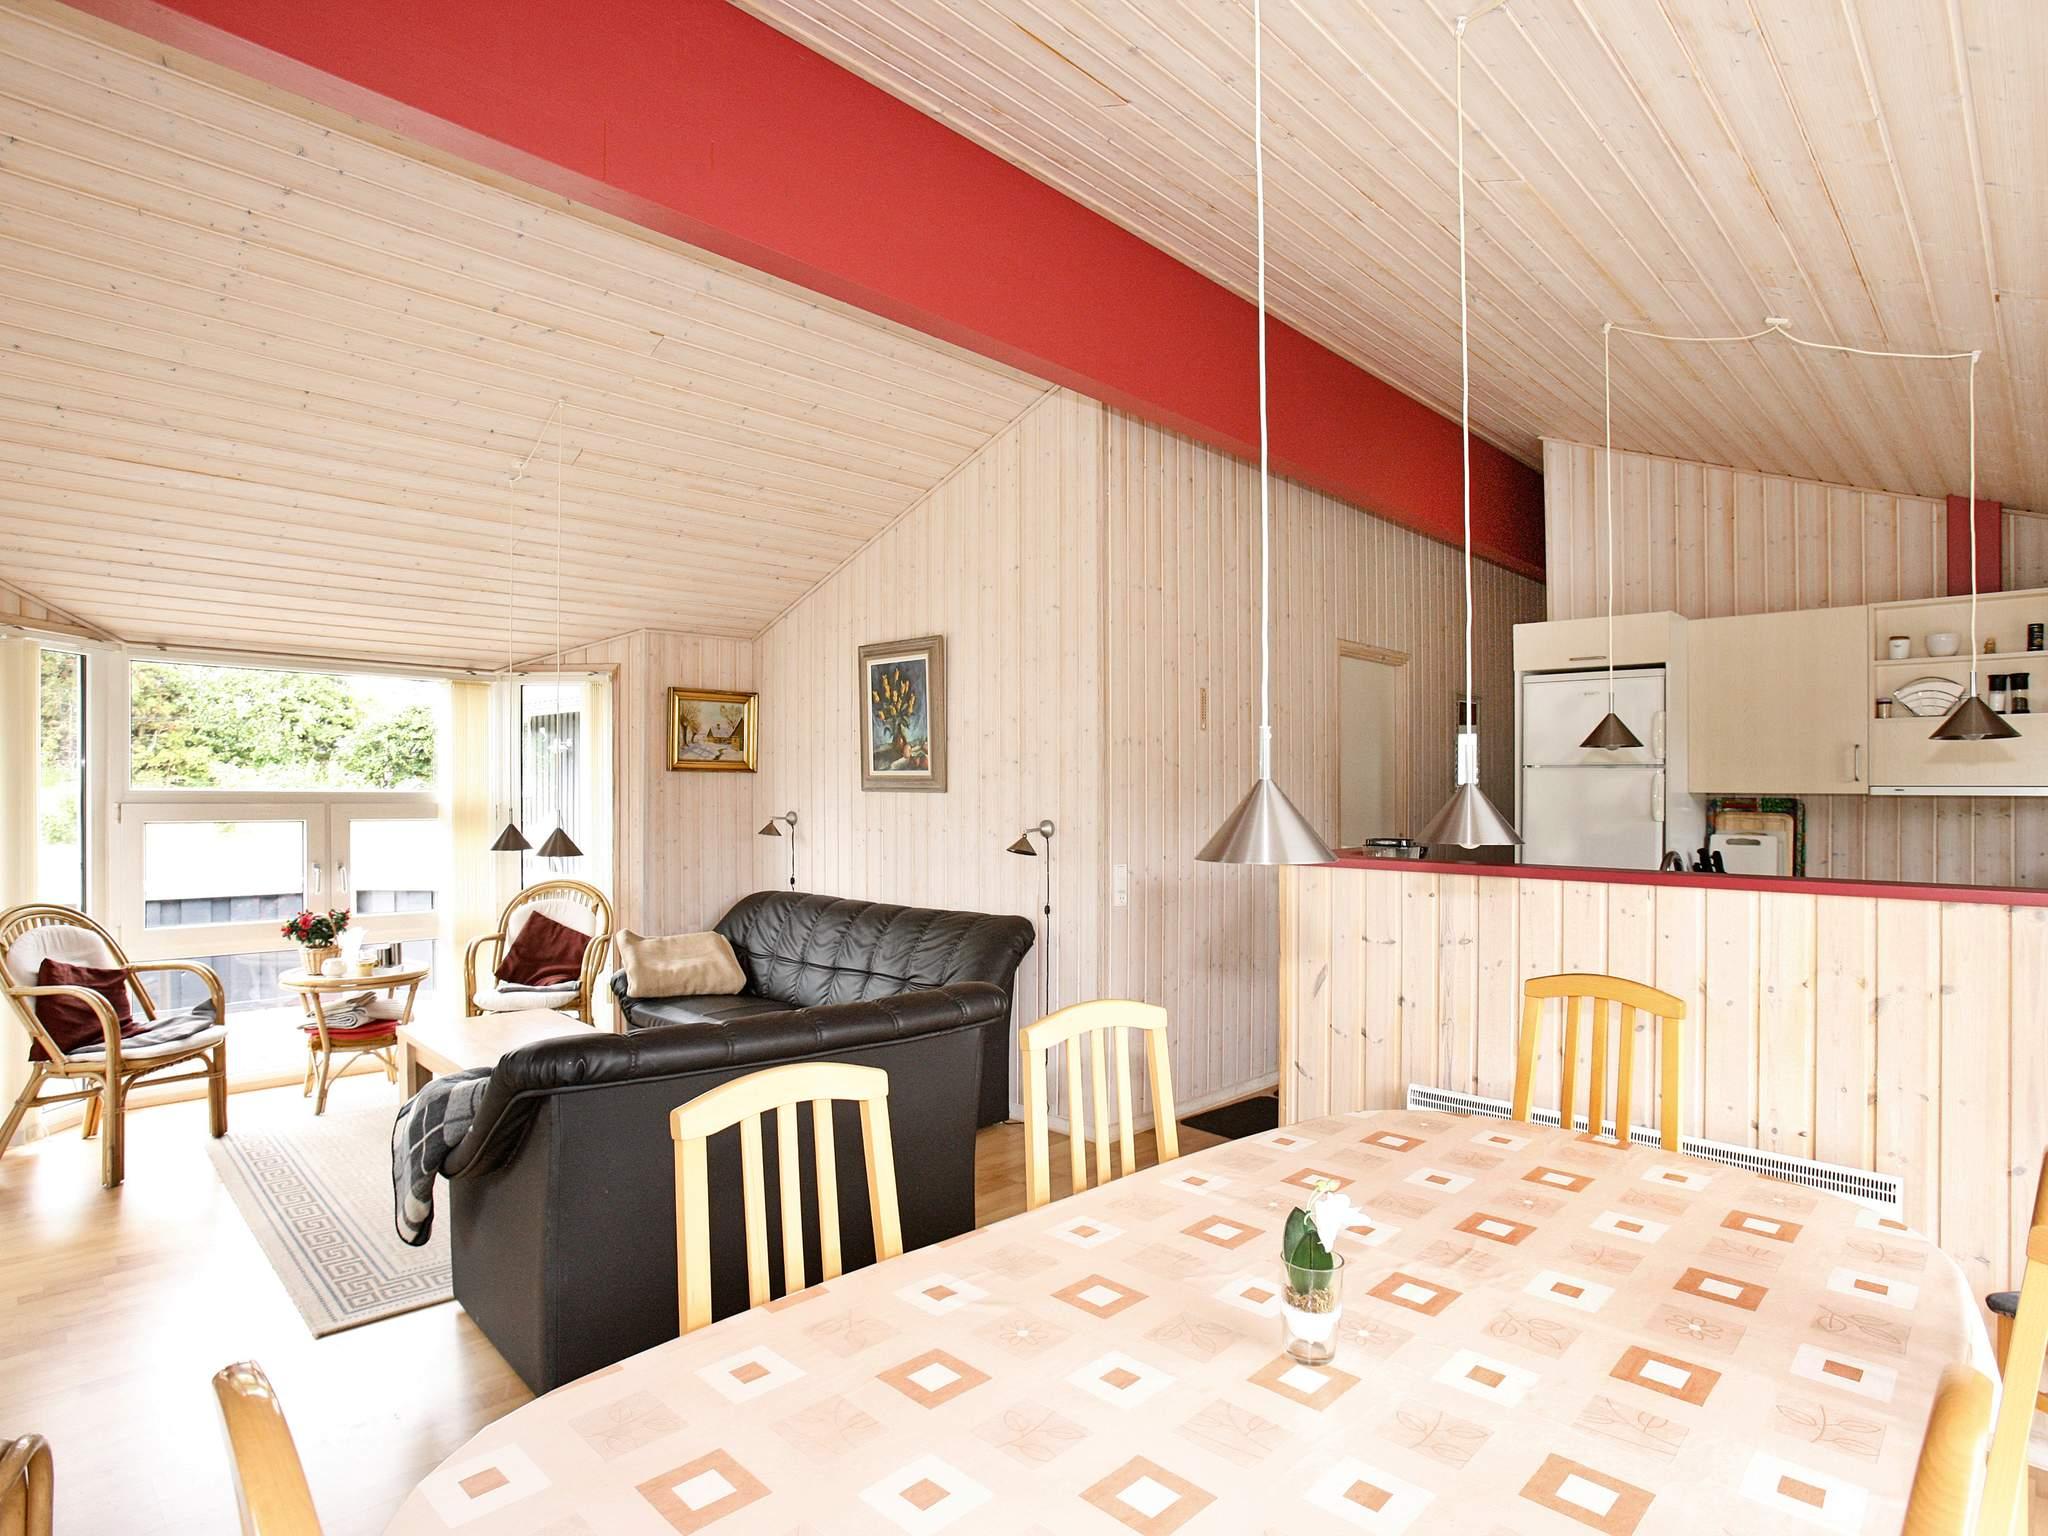 Ferienhaus Øster Hurup (85654), Øster Hurup, , Ostjütland, Dänemark, Bild 5